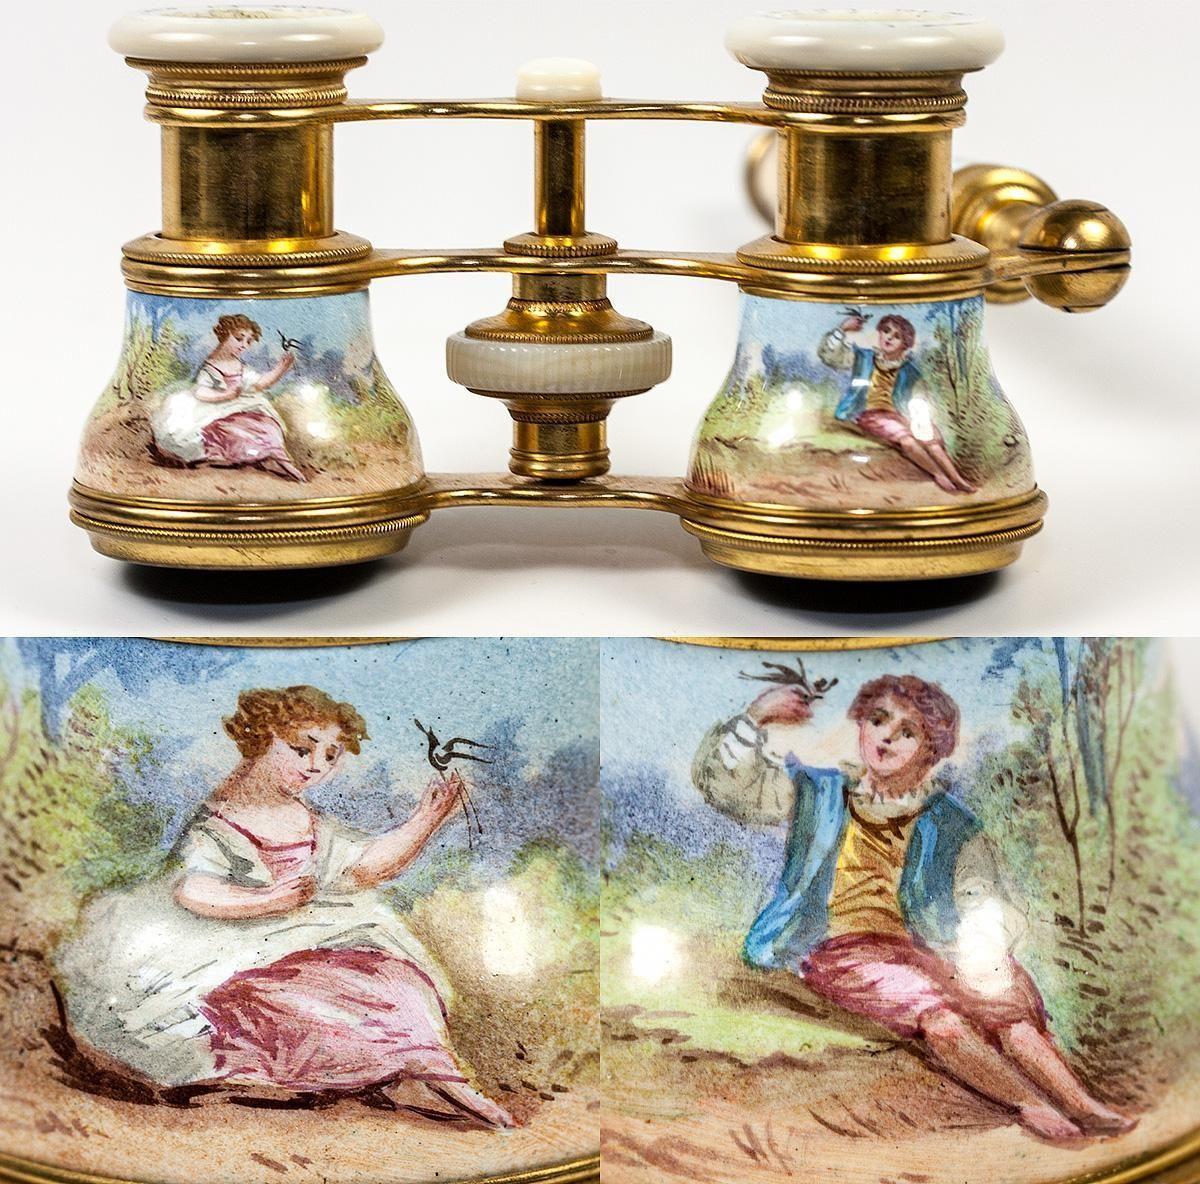 Superb 19th c. French Kiln-fired Enamel Opera Glasses, Binoculars, Lorgnette handle, Colmont, PARIS